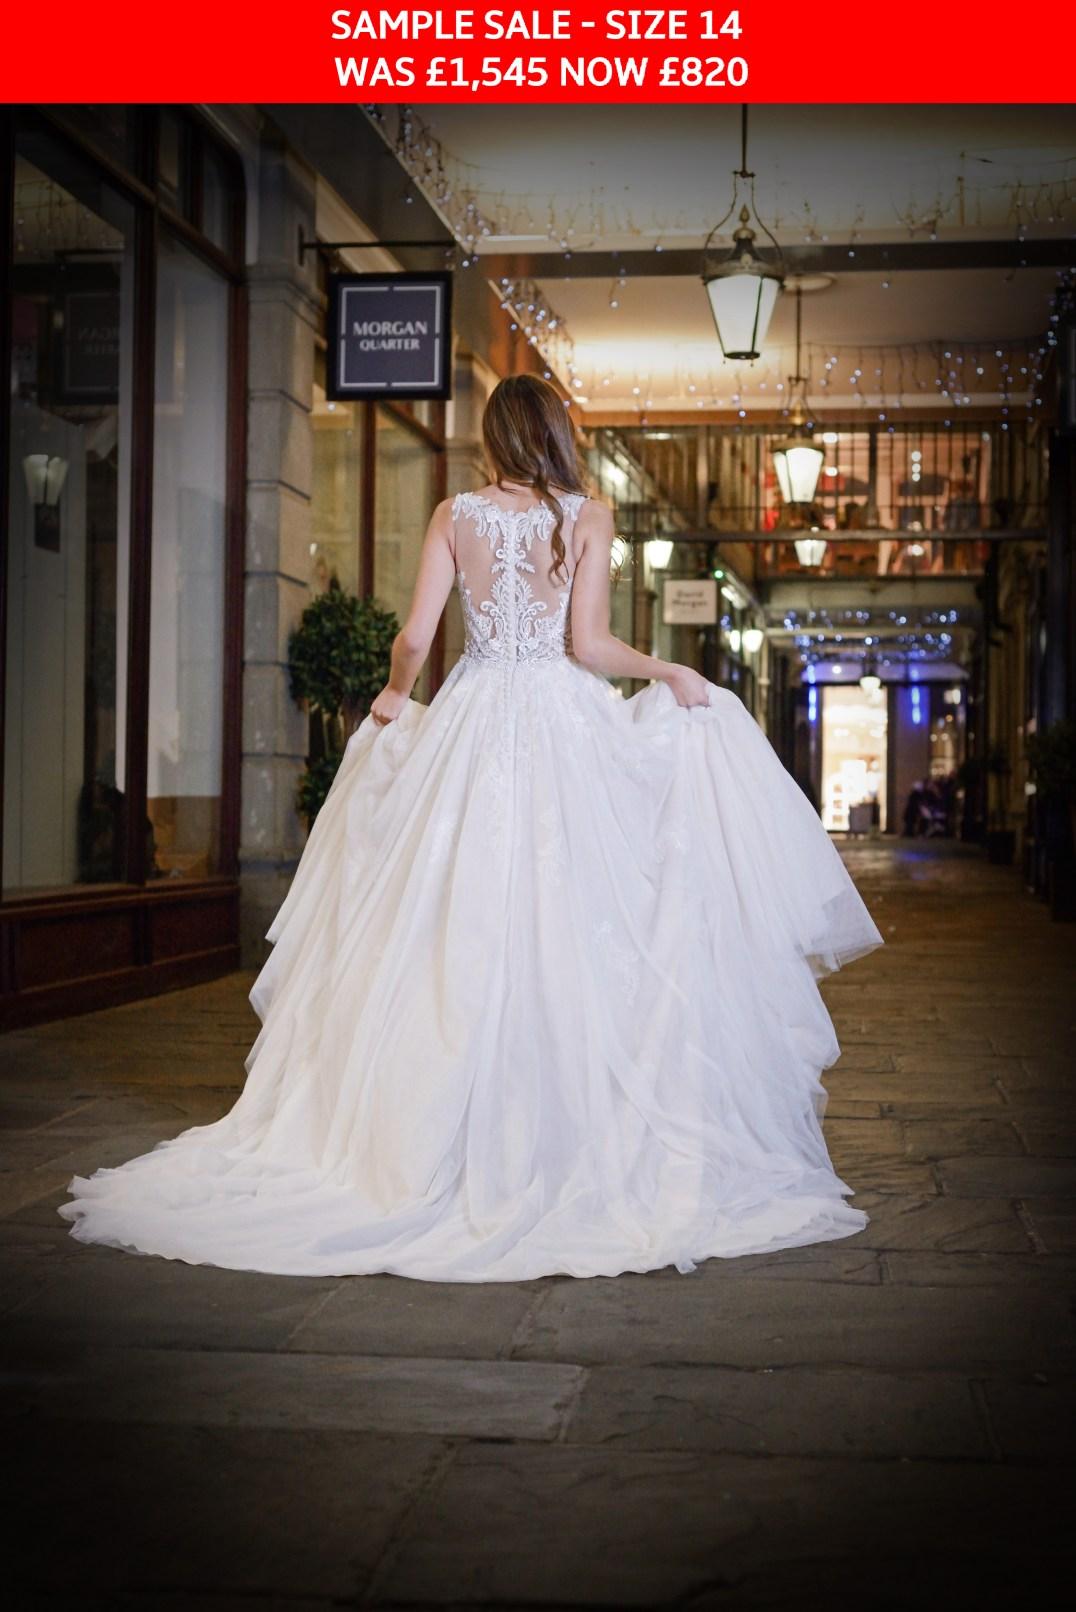 GAIA Isabella bridal gown sample sale